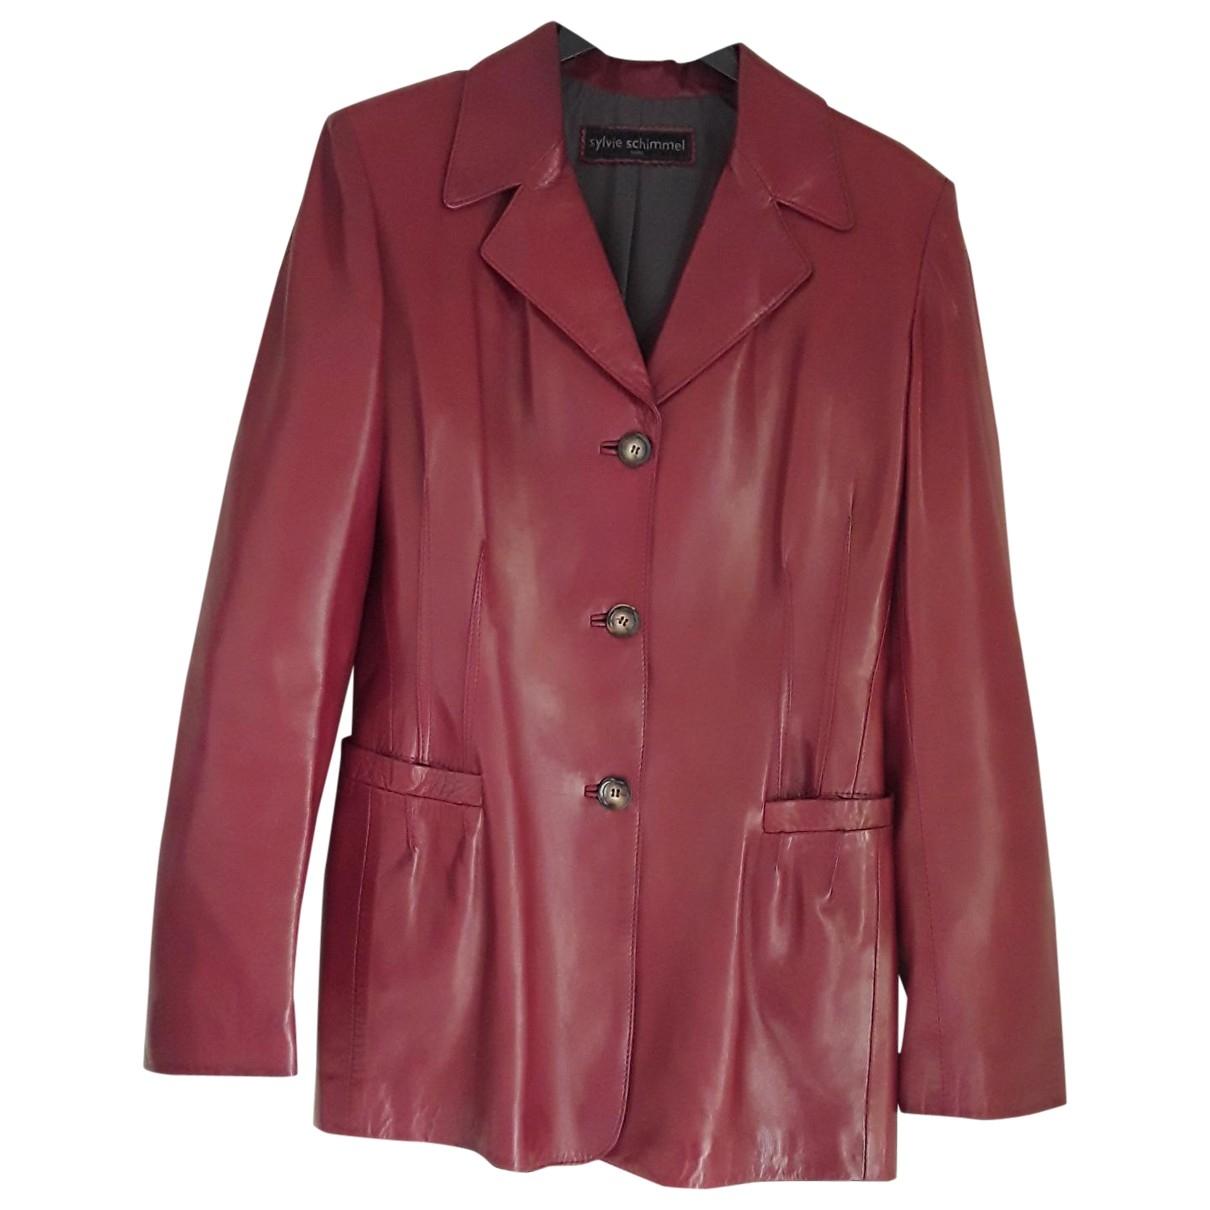 Sylvie Schimmel \N Red Leather jacket for Women 38 FR